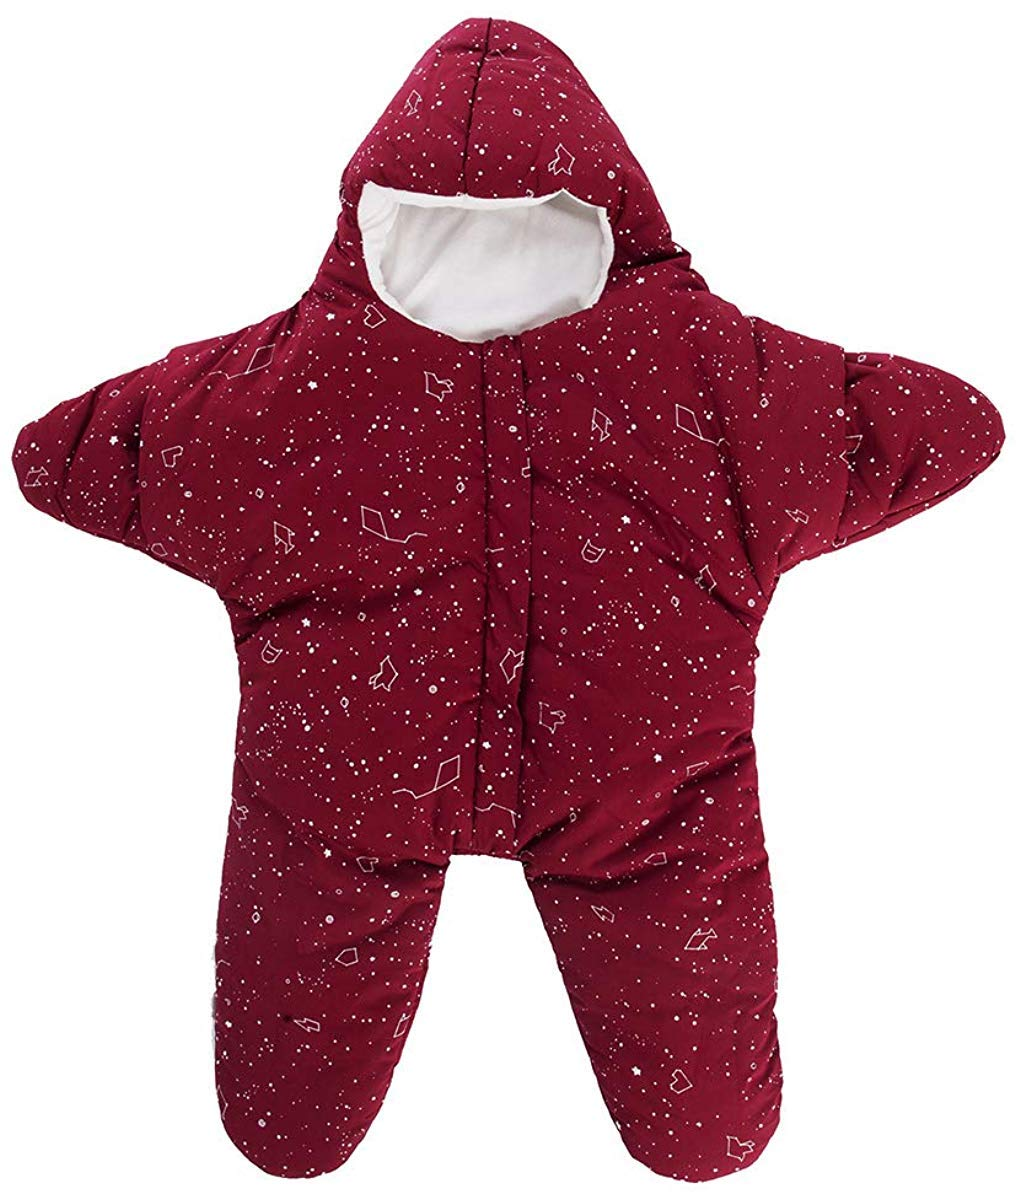 ZYEZI Baby Schlafsack Wickeldecke Universal Baby Anti Kick-Schlafsack Neugeborene Wickeltuch f/ür Bett Buggy Wrap Seestern